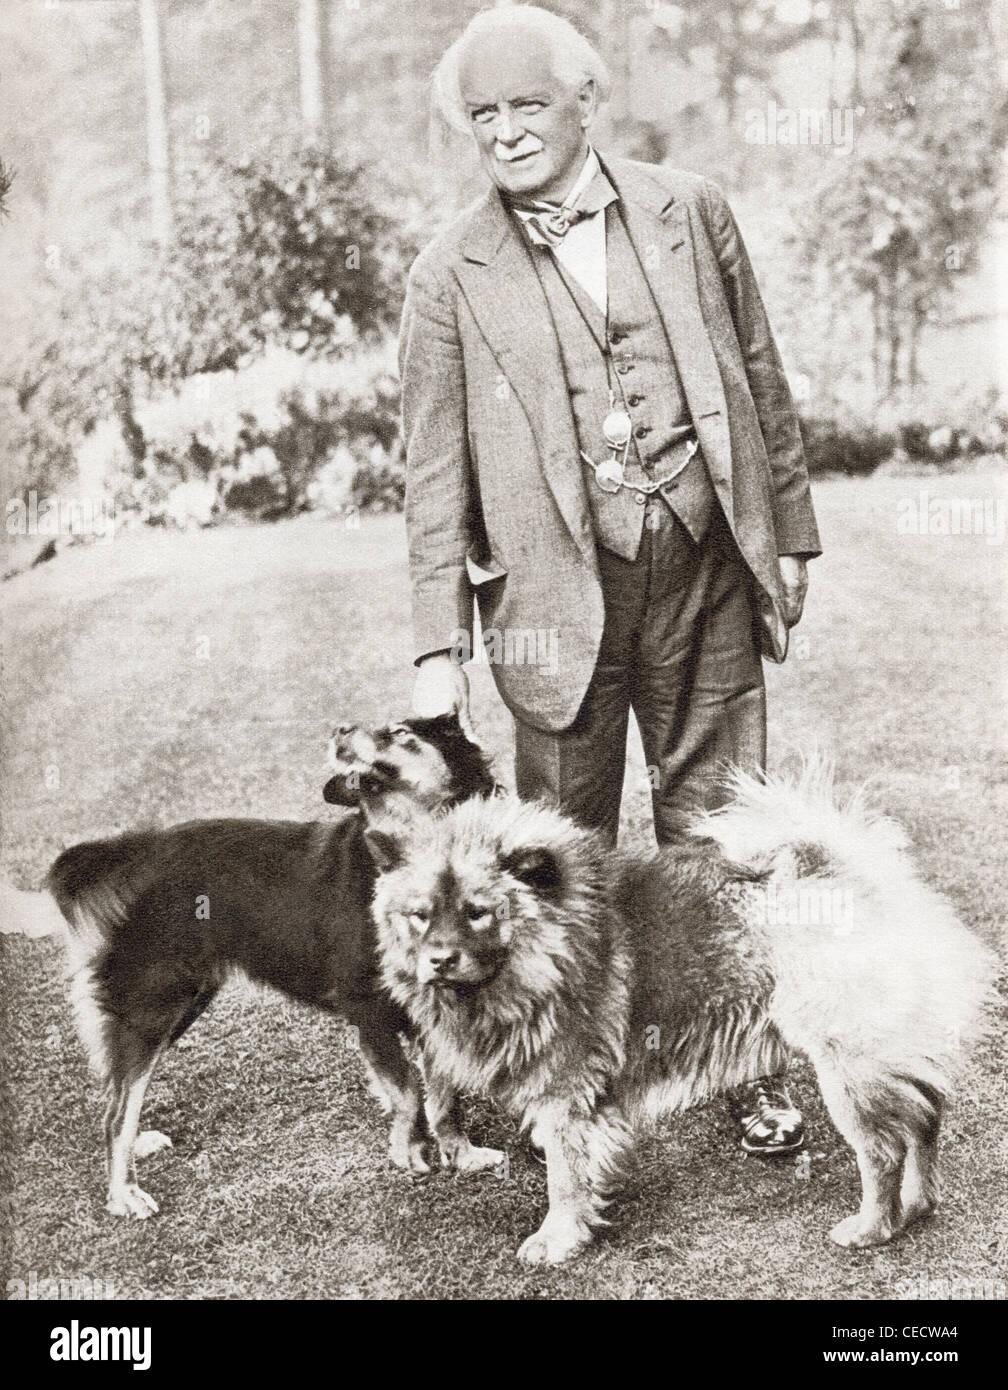 David Lloyd George, 1st Earl Lloyd-George of Dwyfor, 1863 – 1945. British Prime Minister. - Stock Image